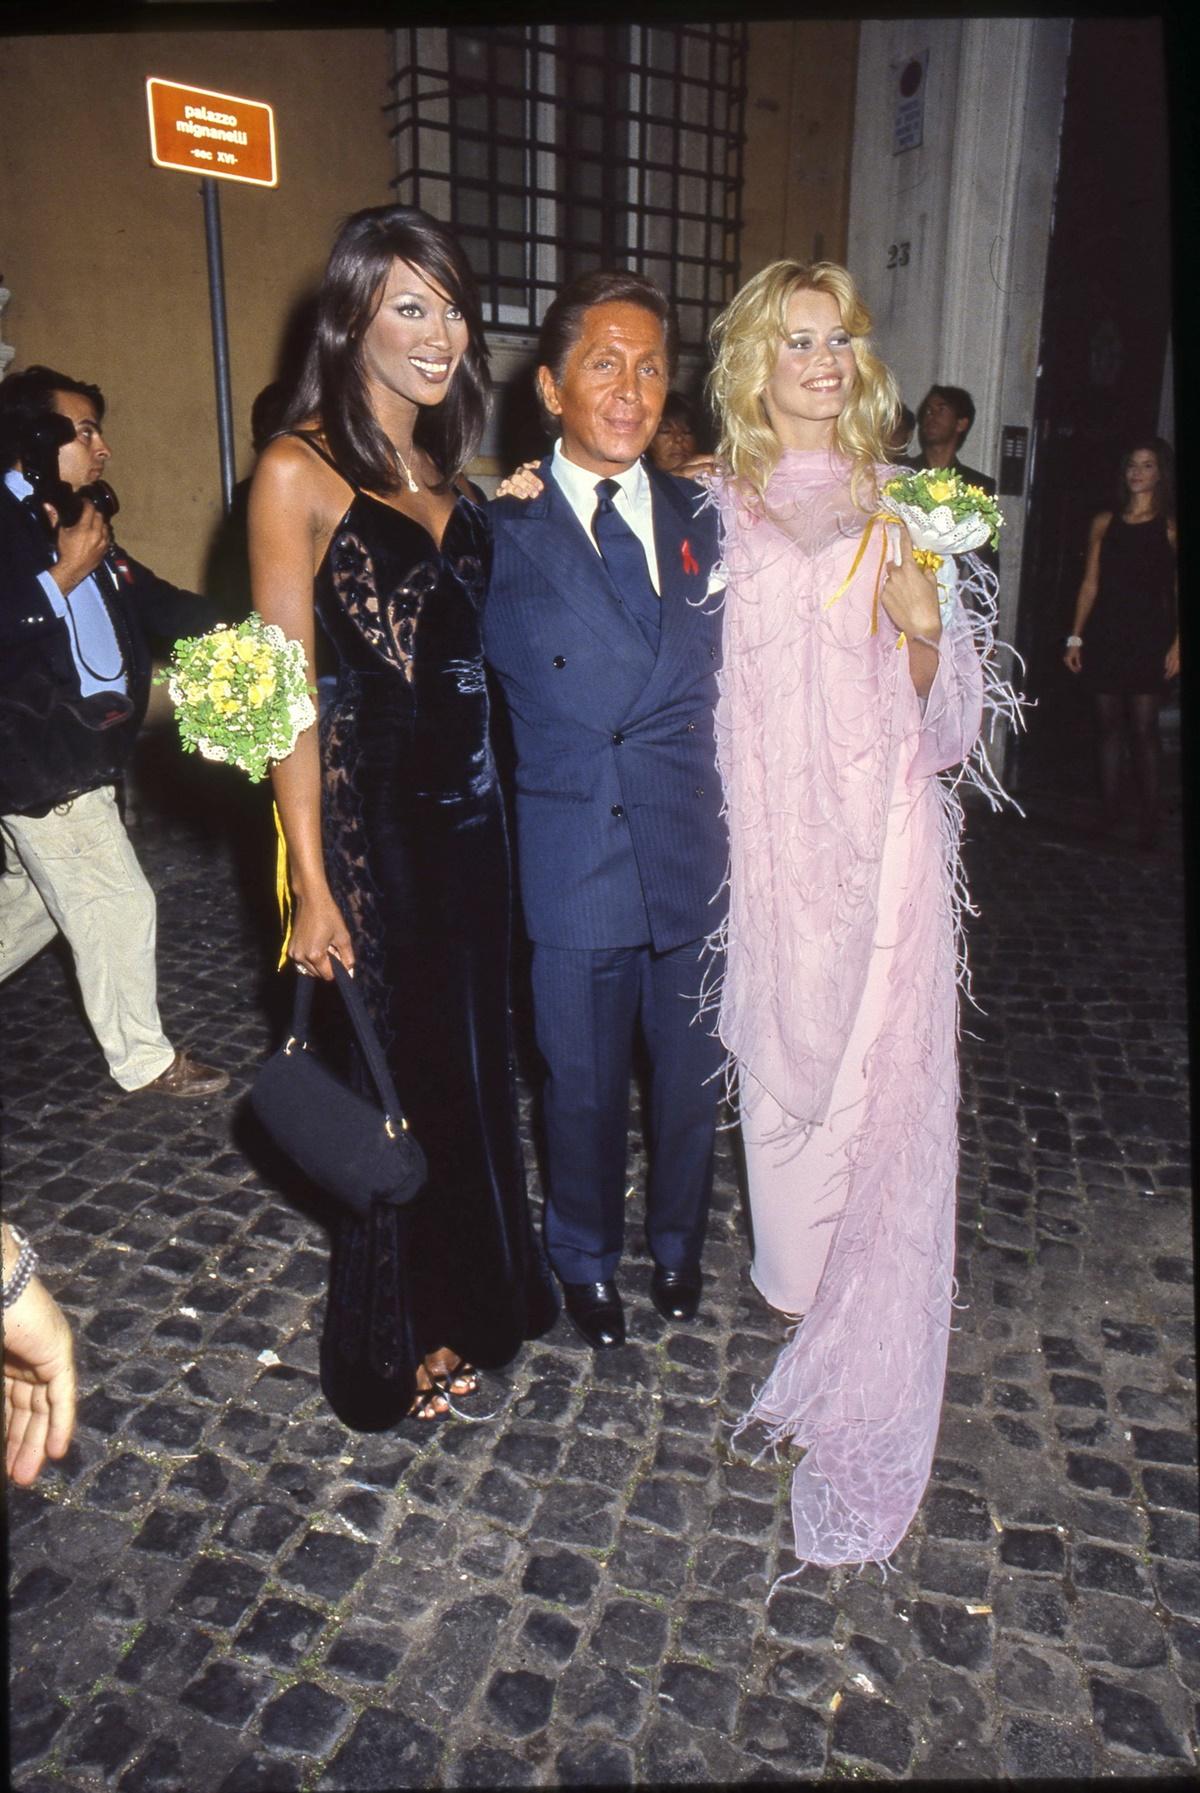 Naomi Campbell, Valentino, Claudia Schiffer